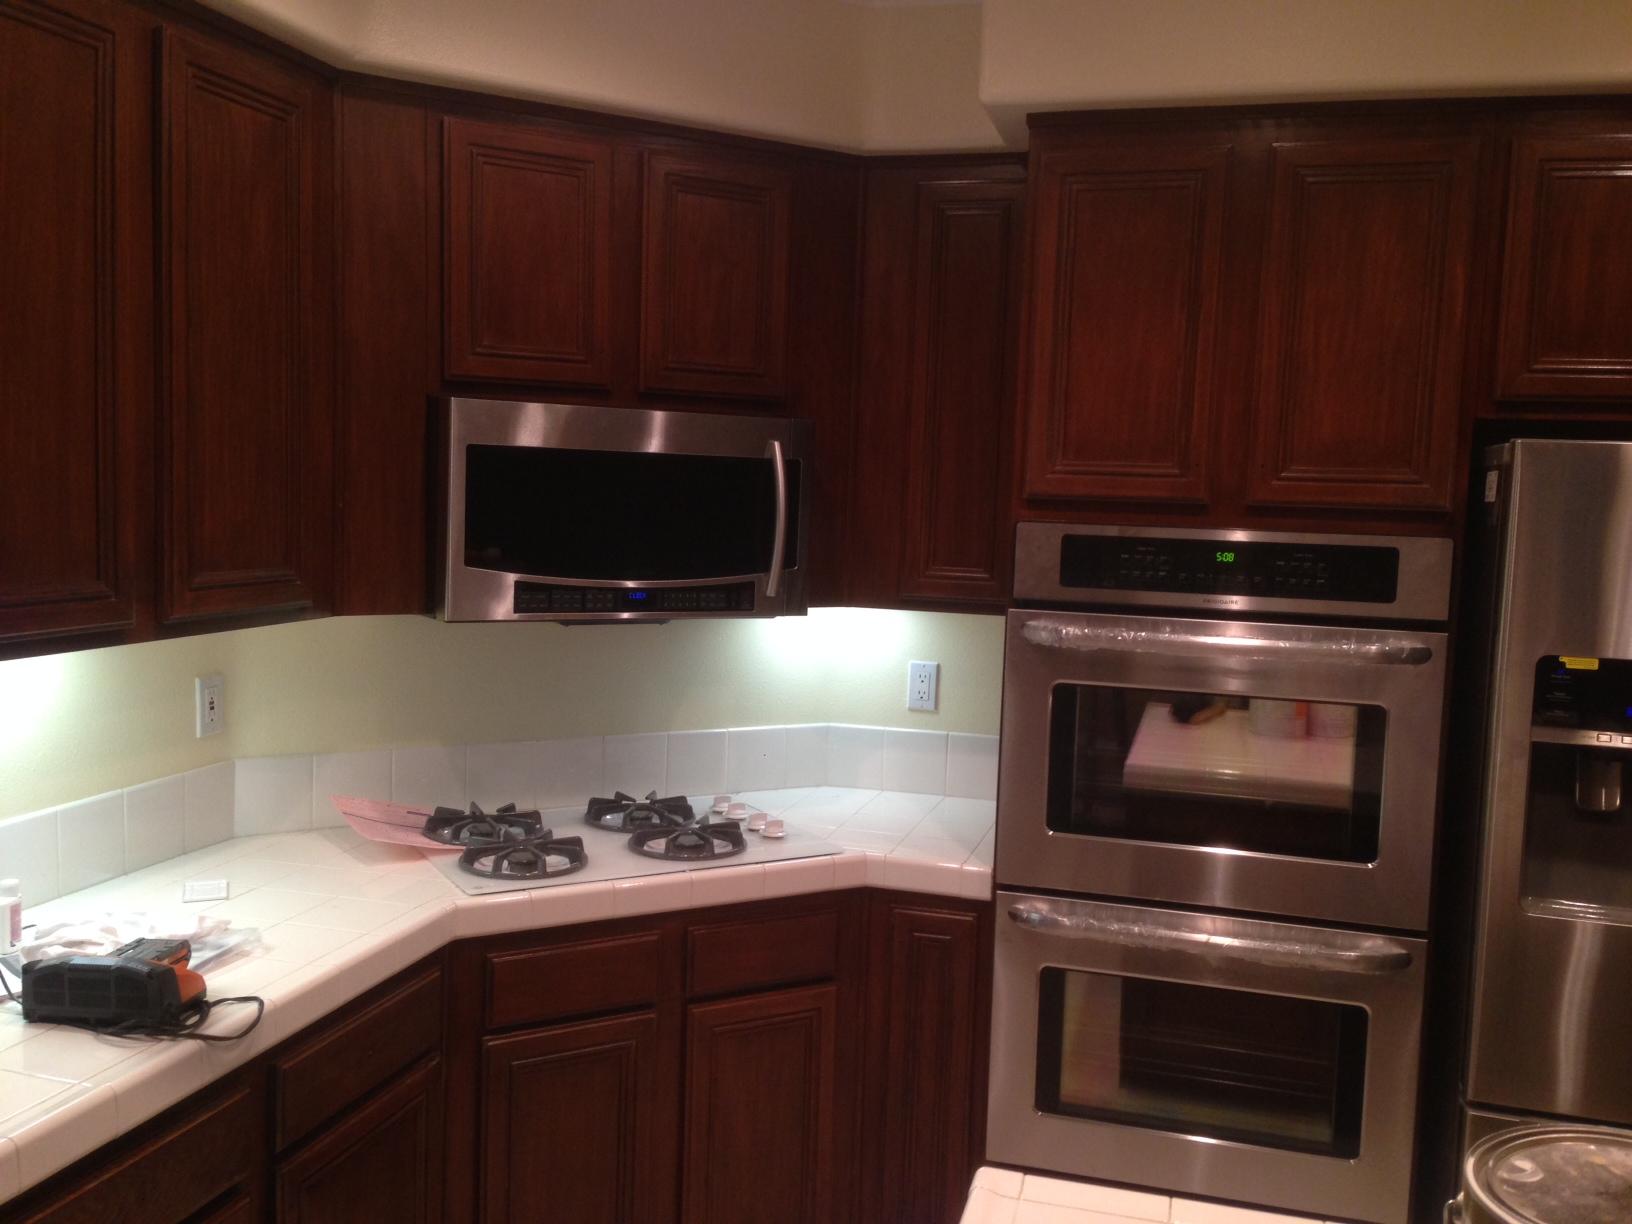 kitchen cabinet refinishing refinish kitchen cabinets temecula kitchen refinishing before photo kitchen cabinet refinishing temecula